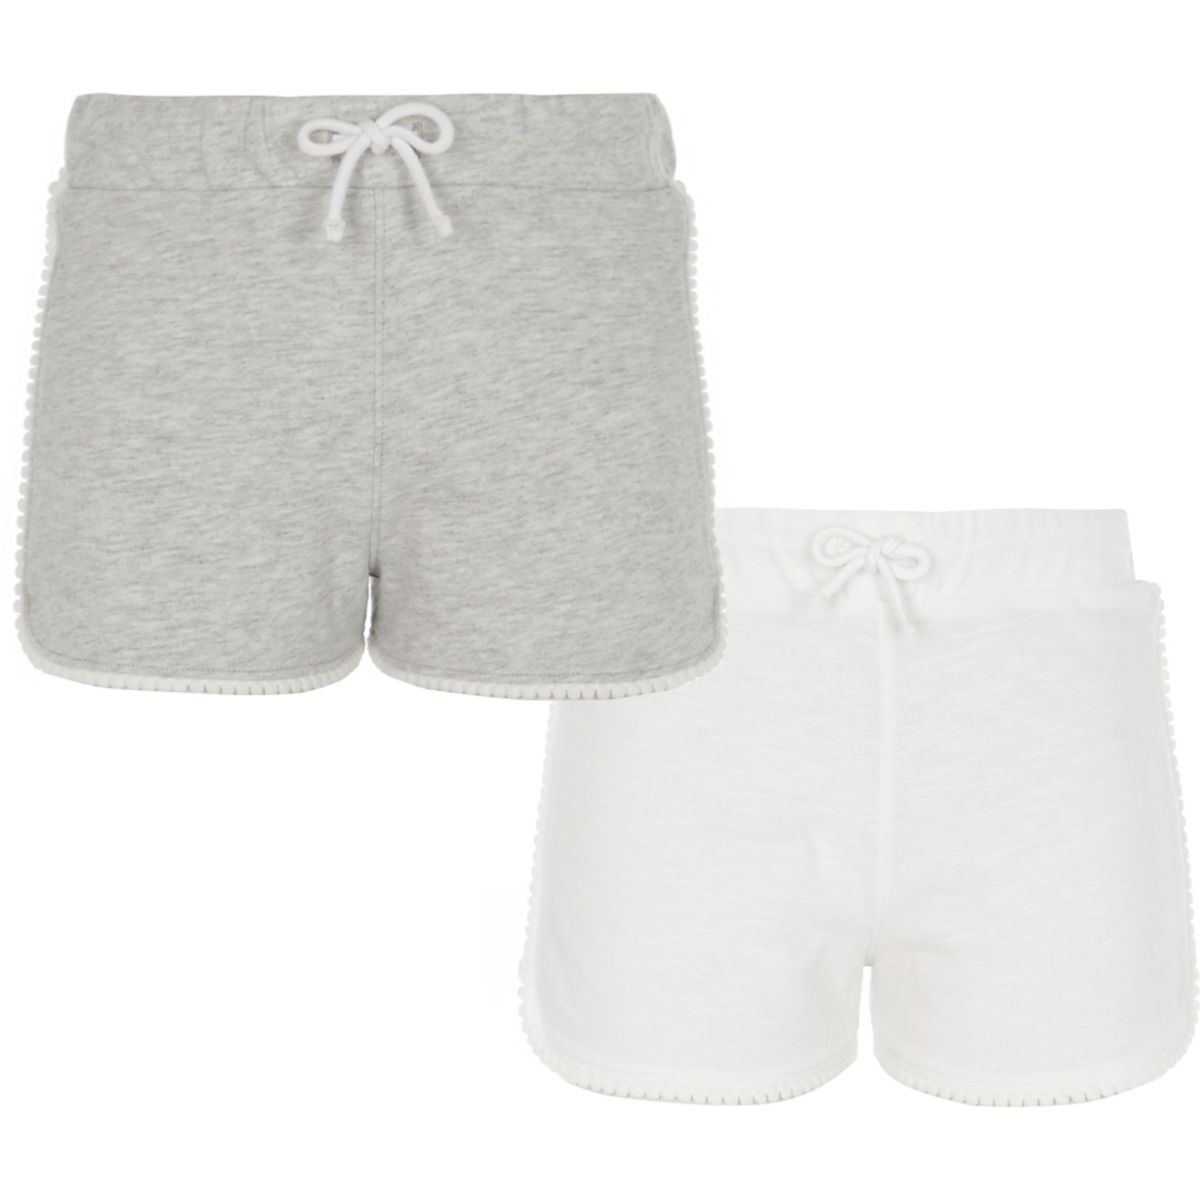 Girls grey and white runner shorts multipack